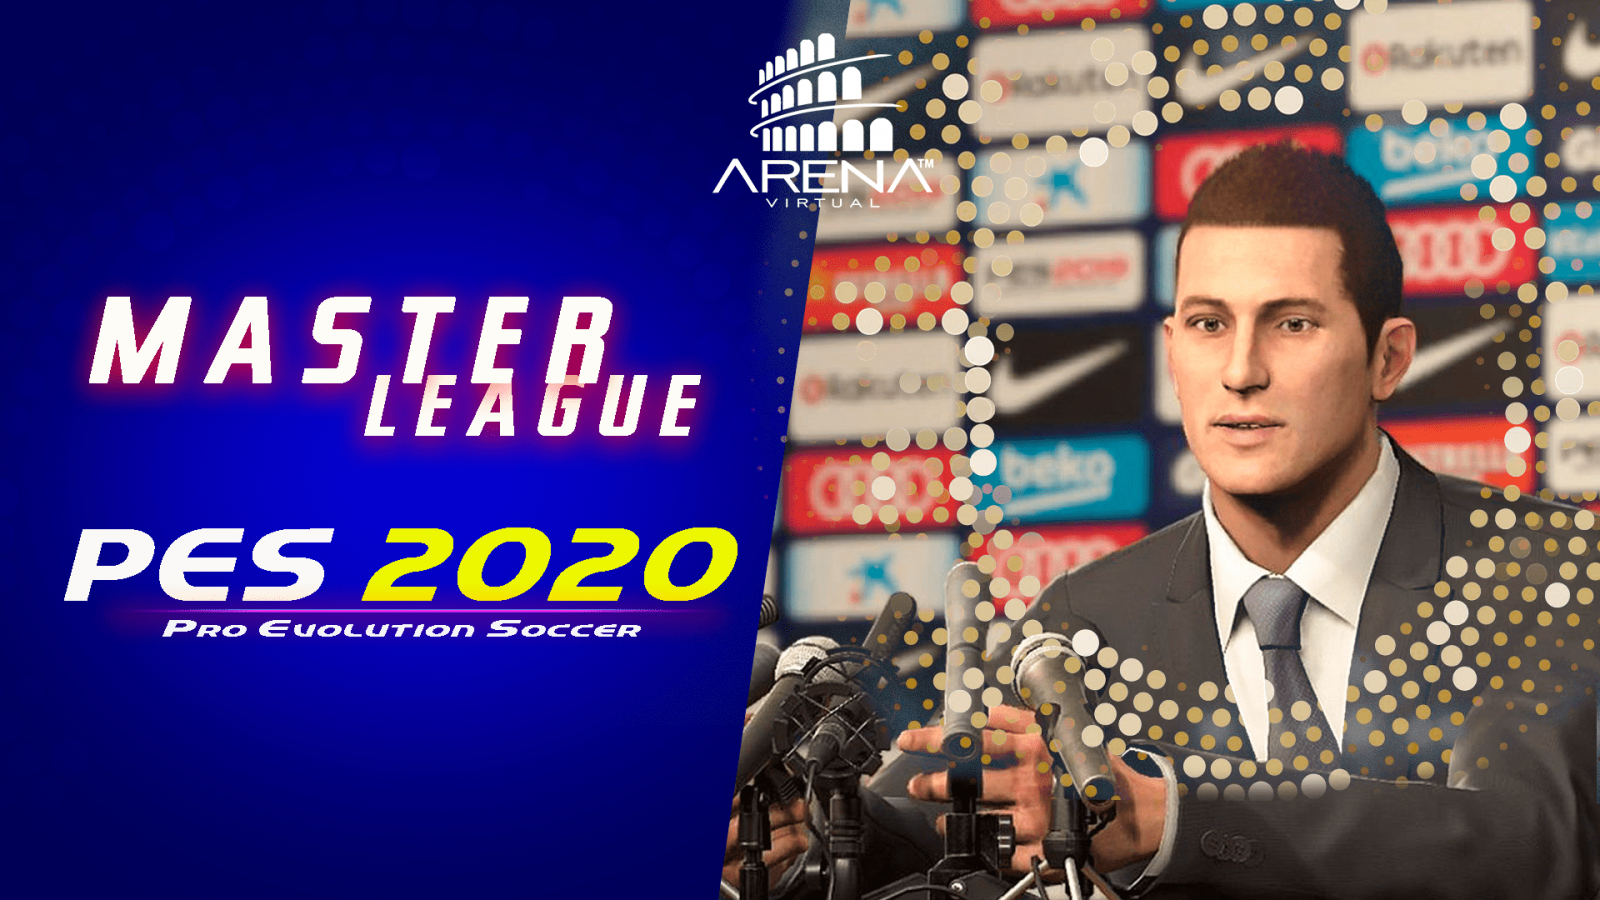 PES 2020 - MASTER LEAGUE